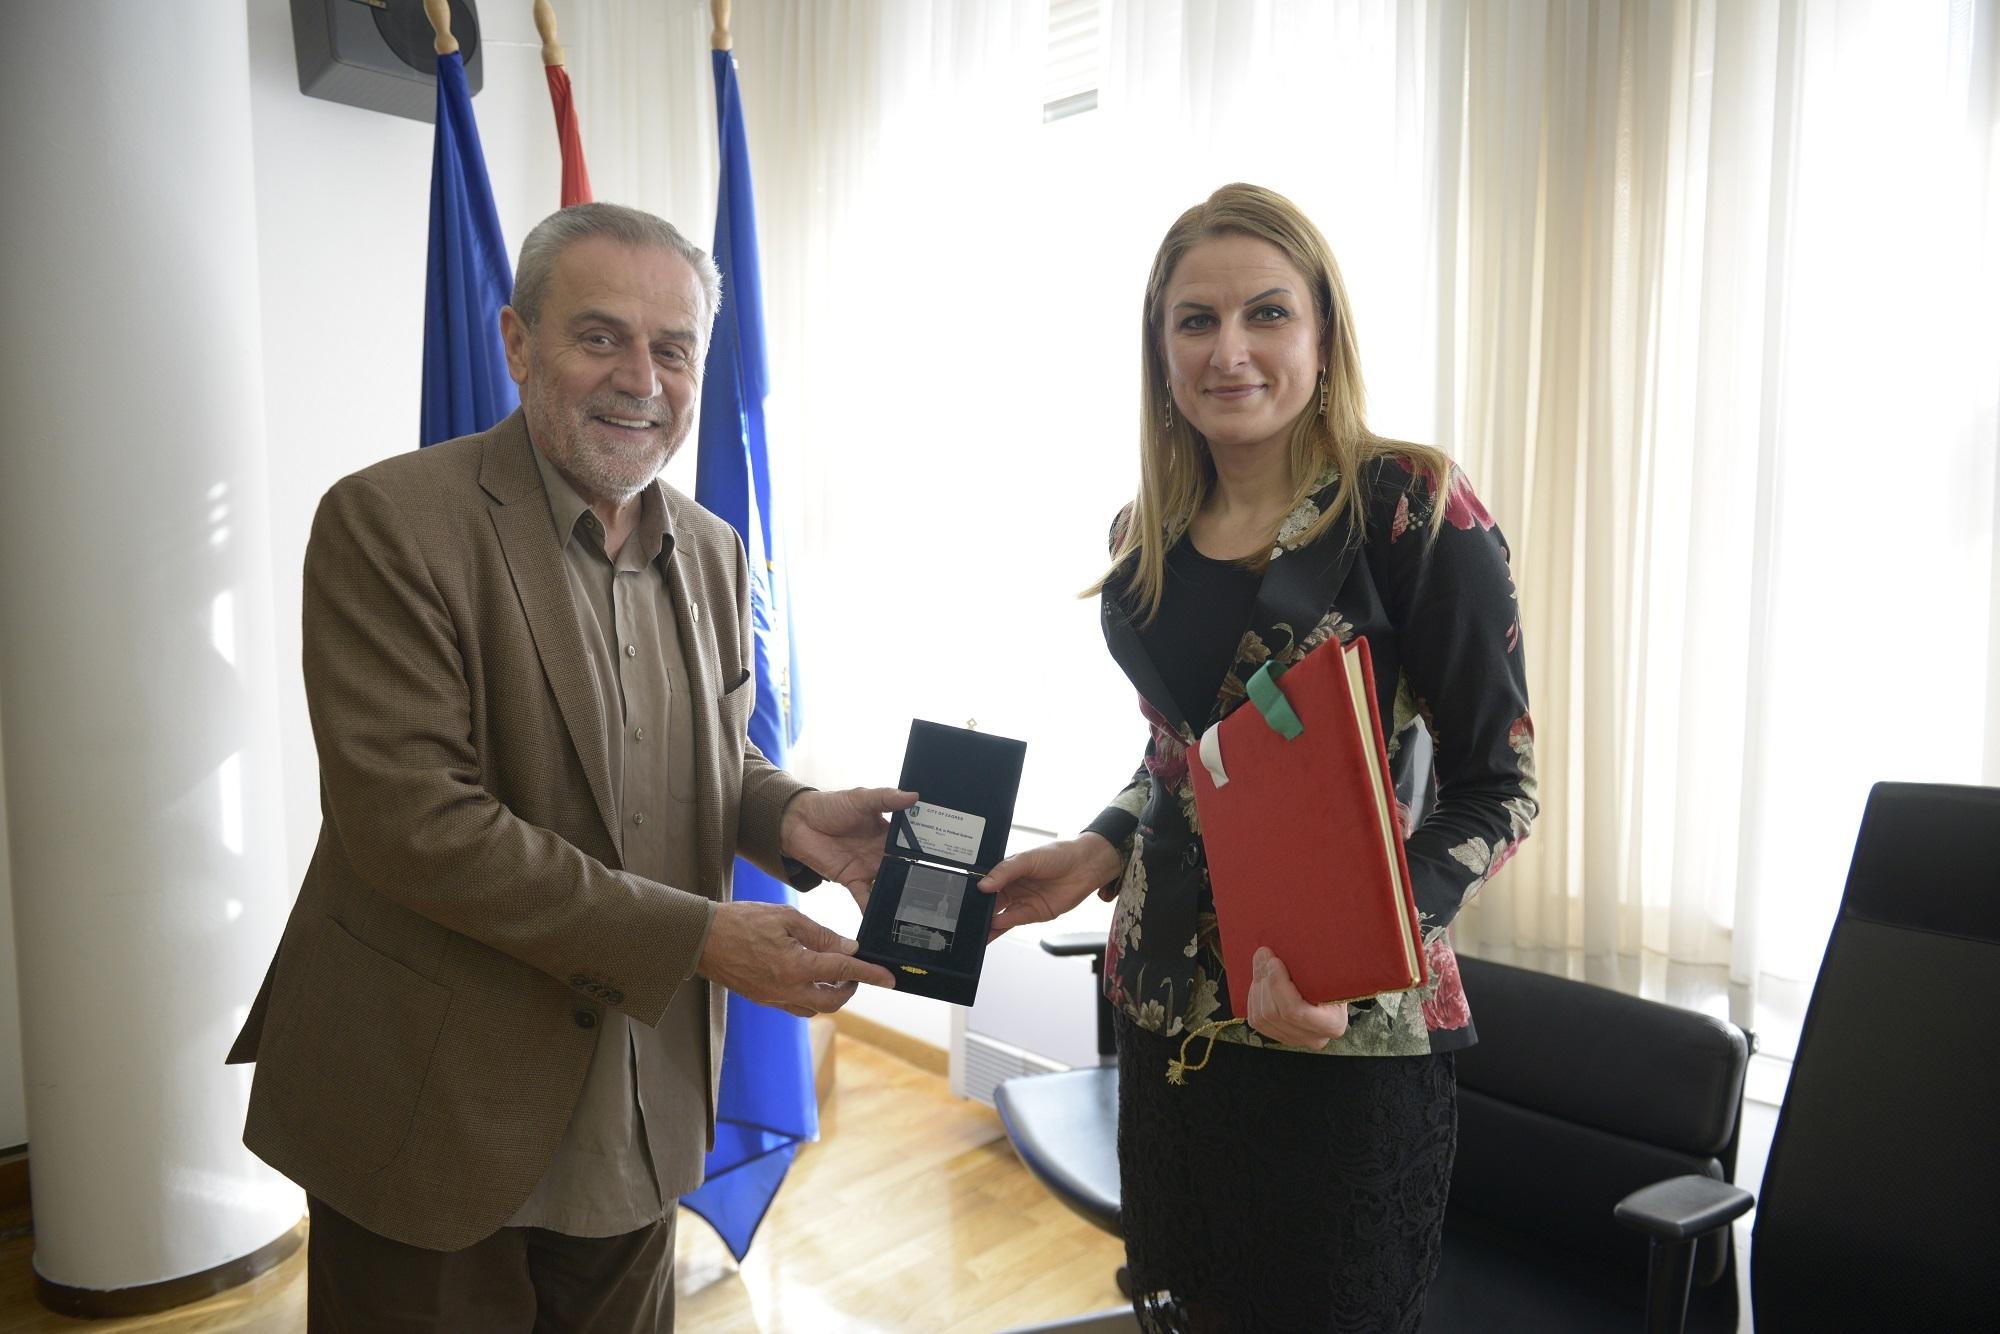 Градоначелница Сомбора Душанка Голубовић и градоначелник Загреба Милан Бандић